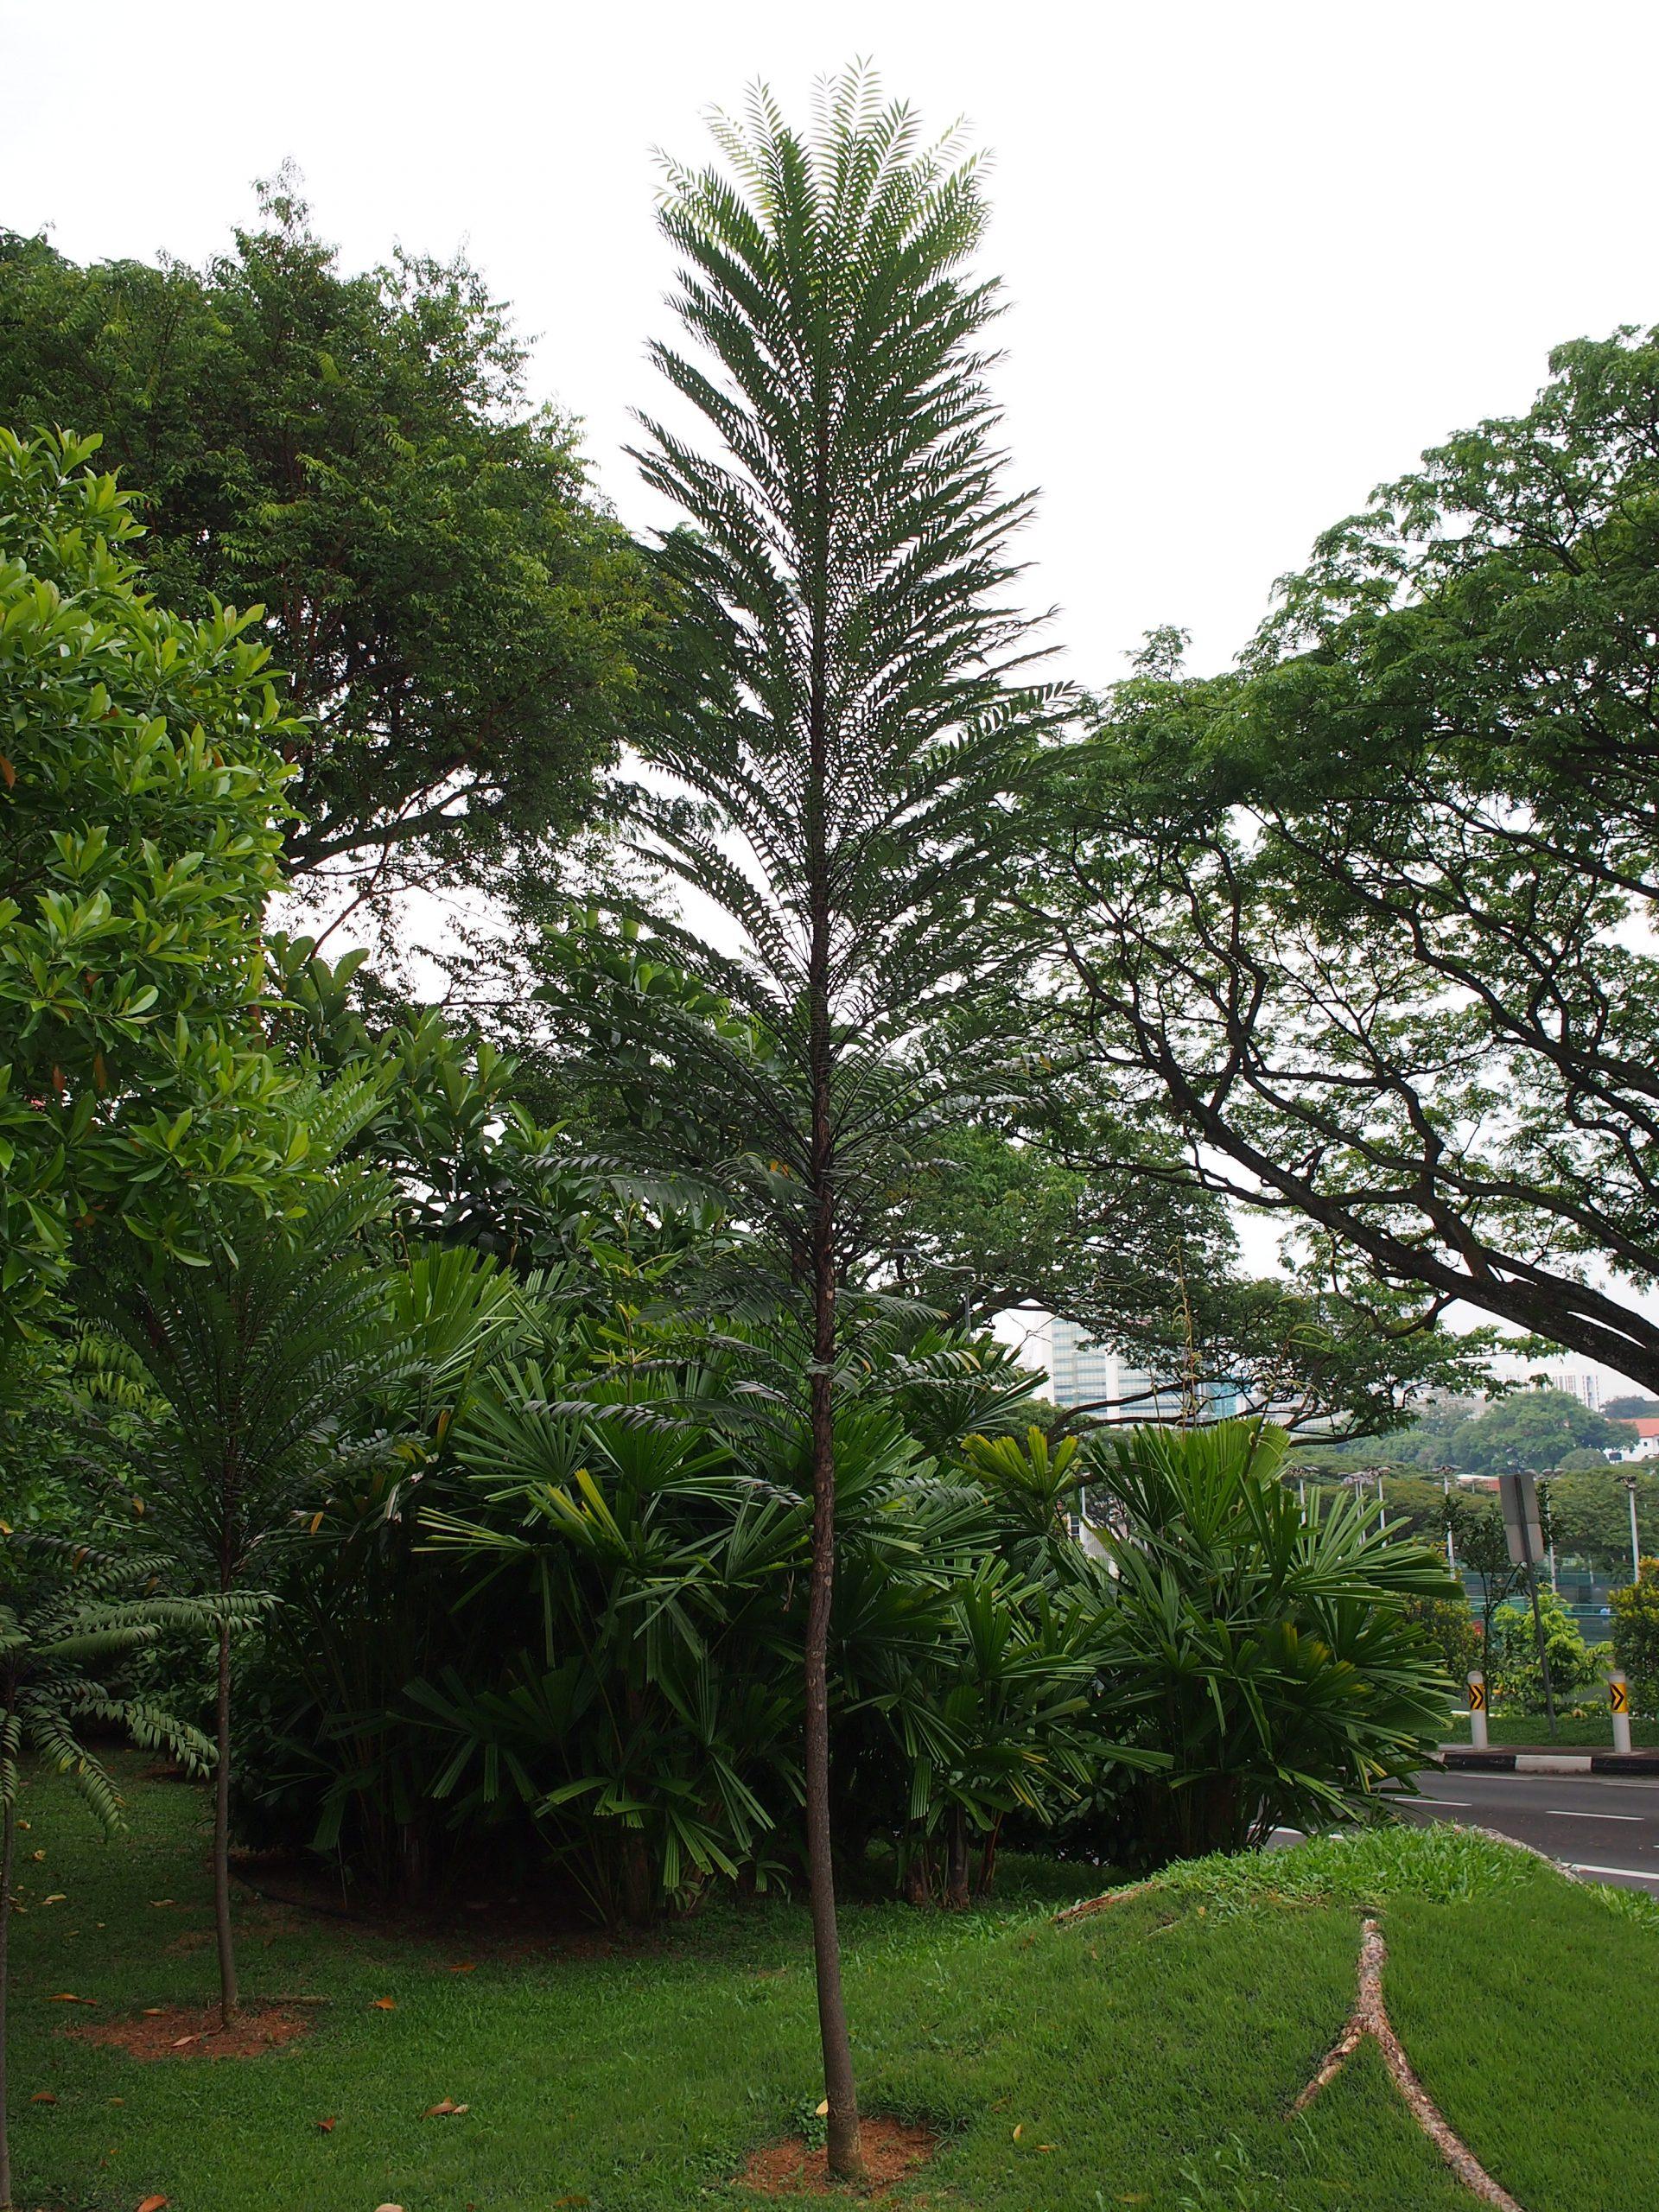 tongkat ali longifolia tree in Singapore